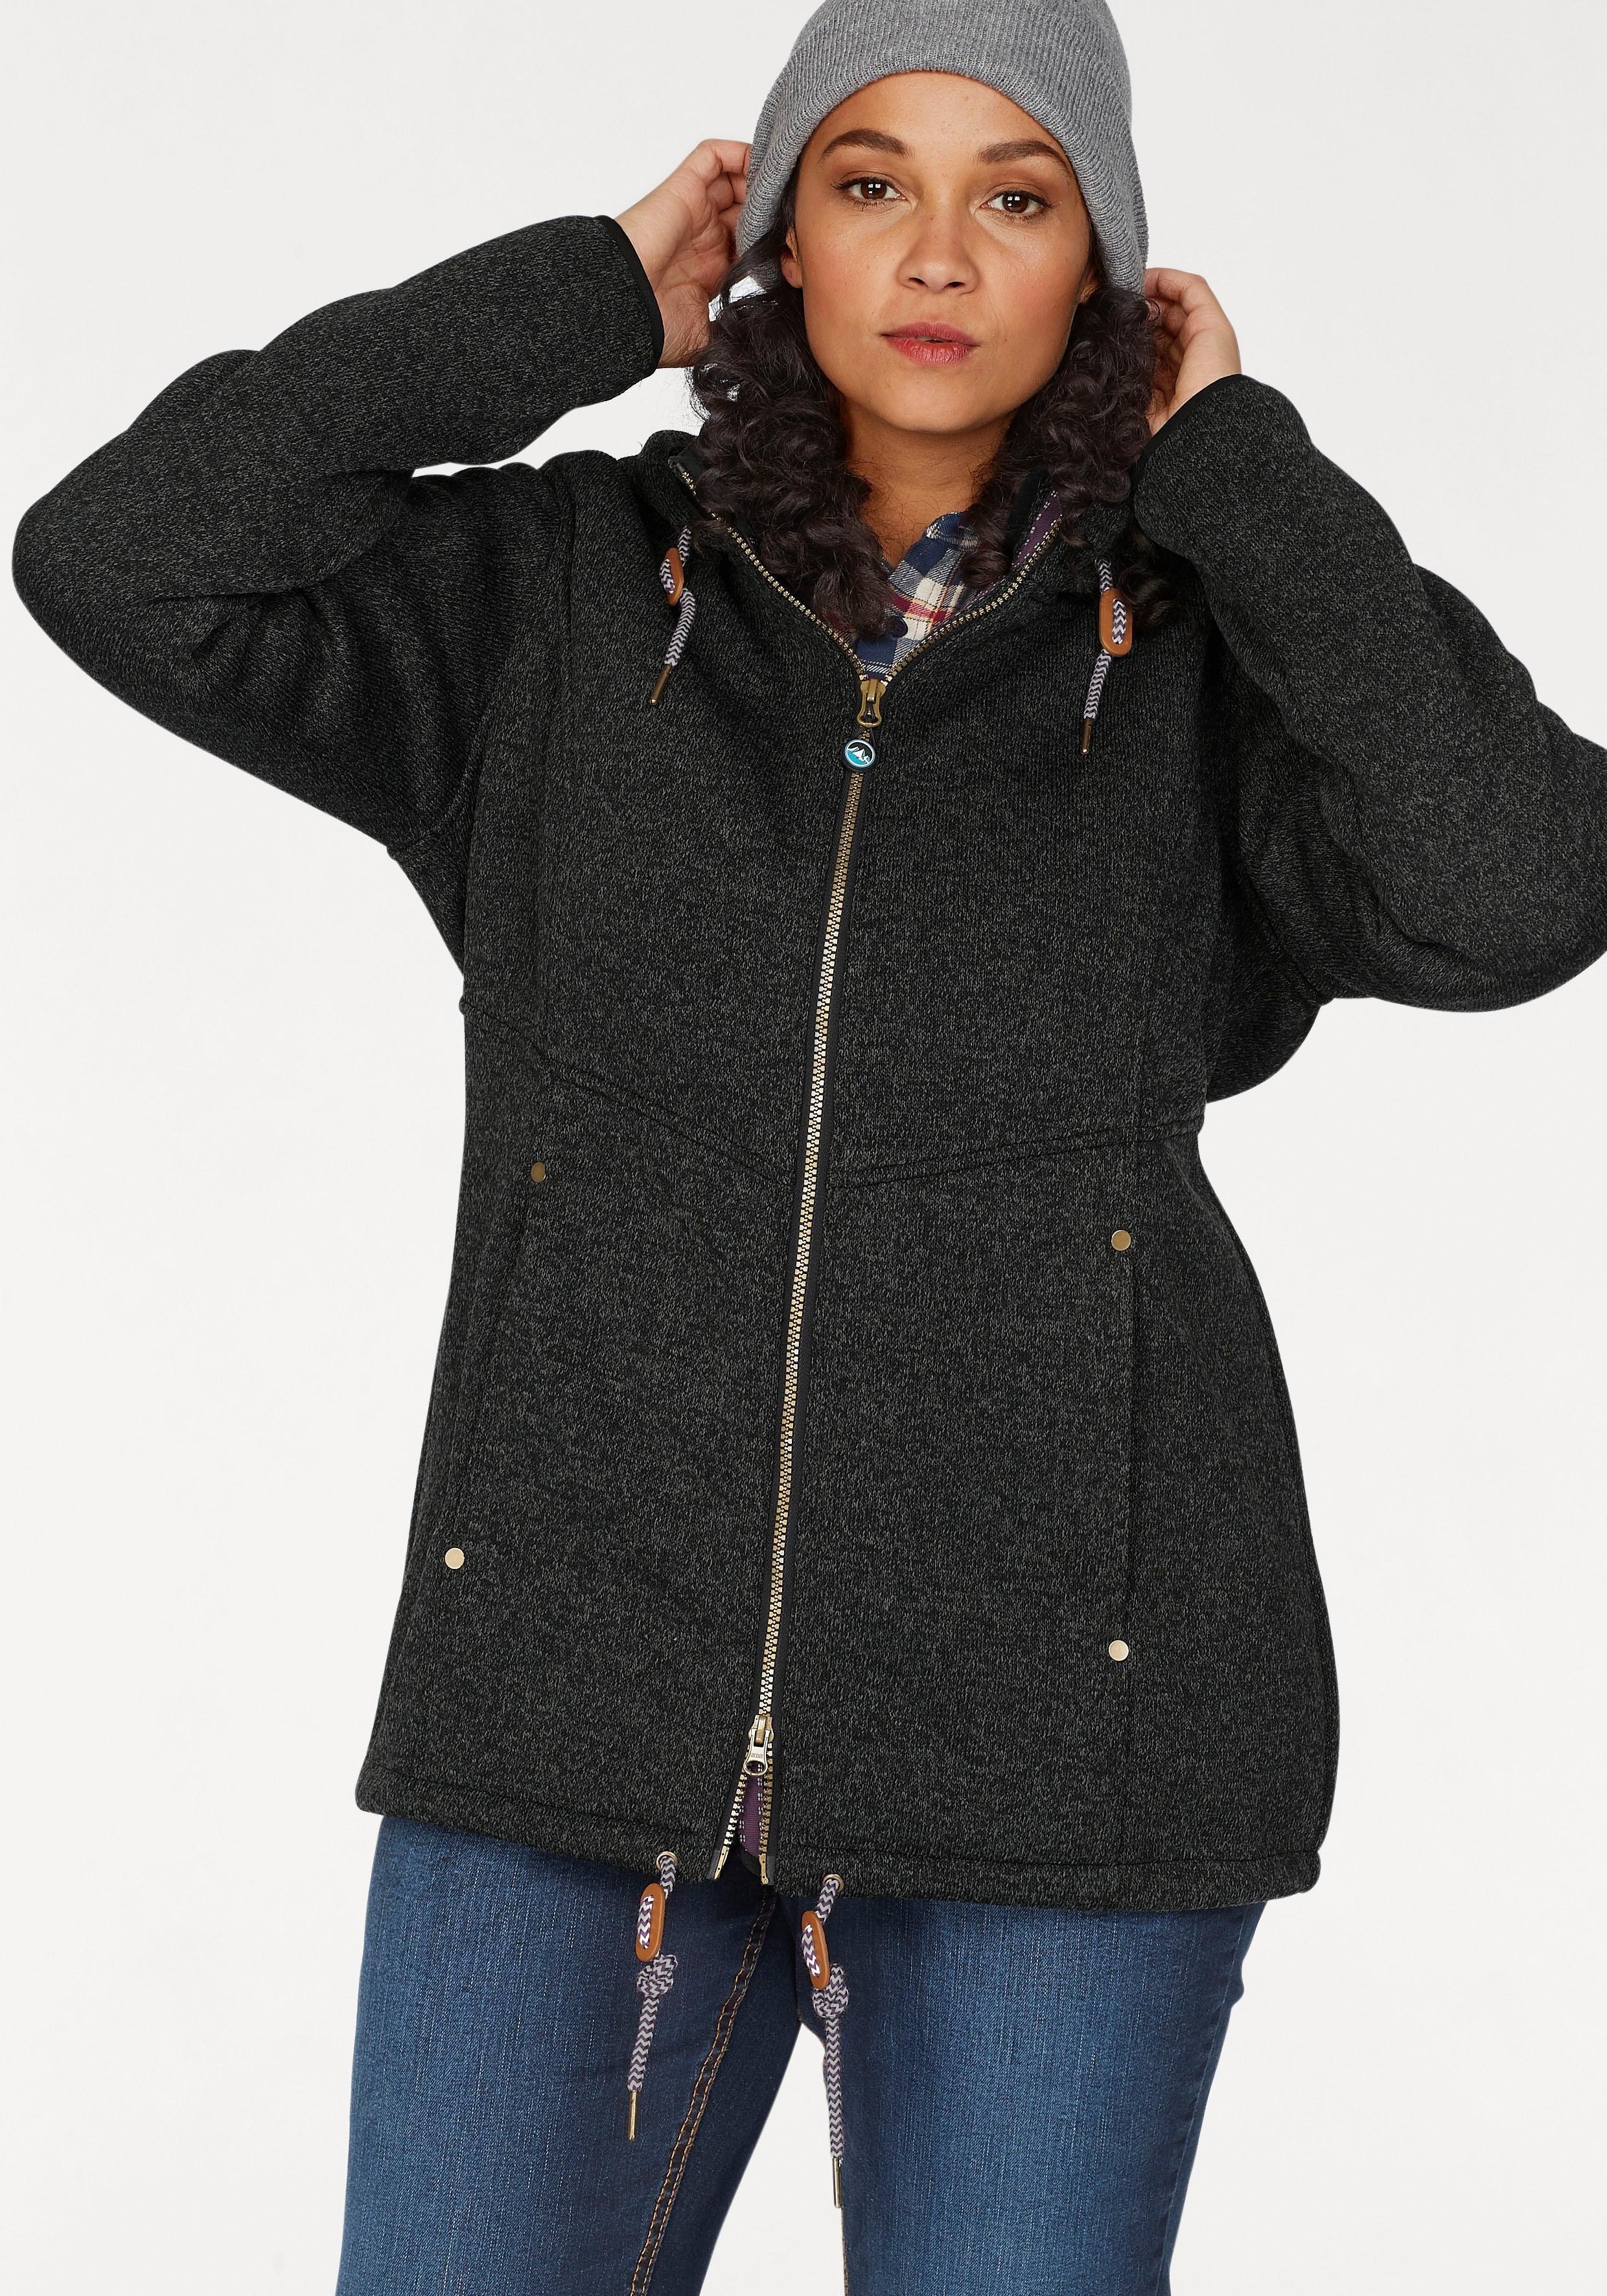 Polarino tricot fleecejack nu online bestellen